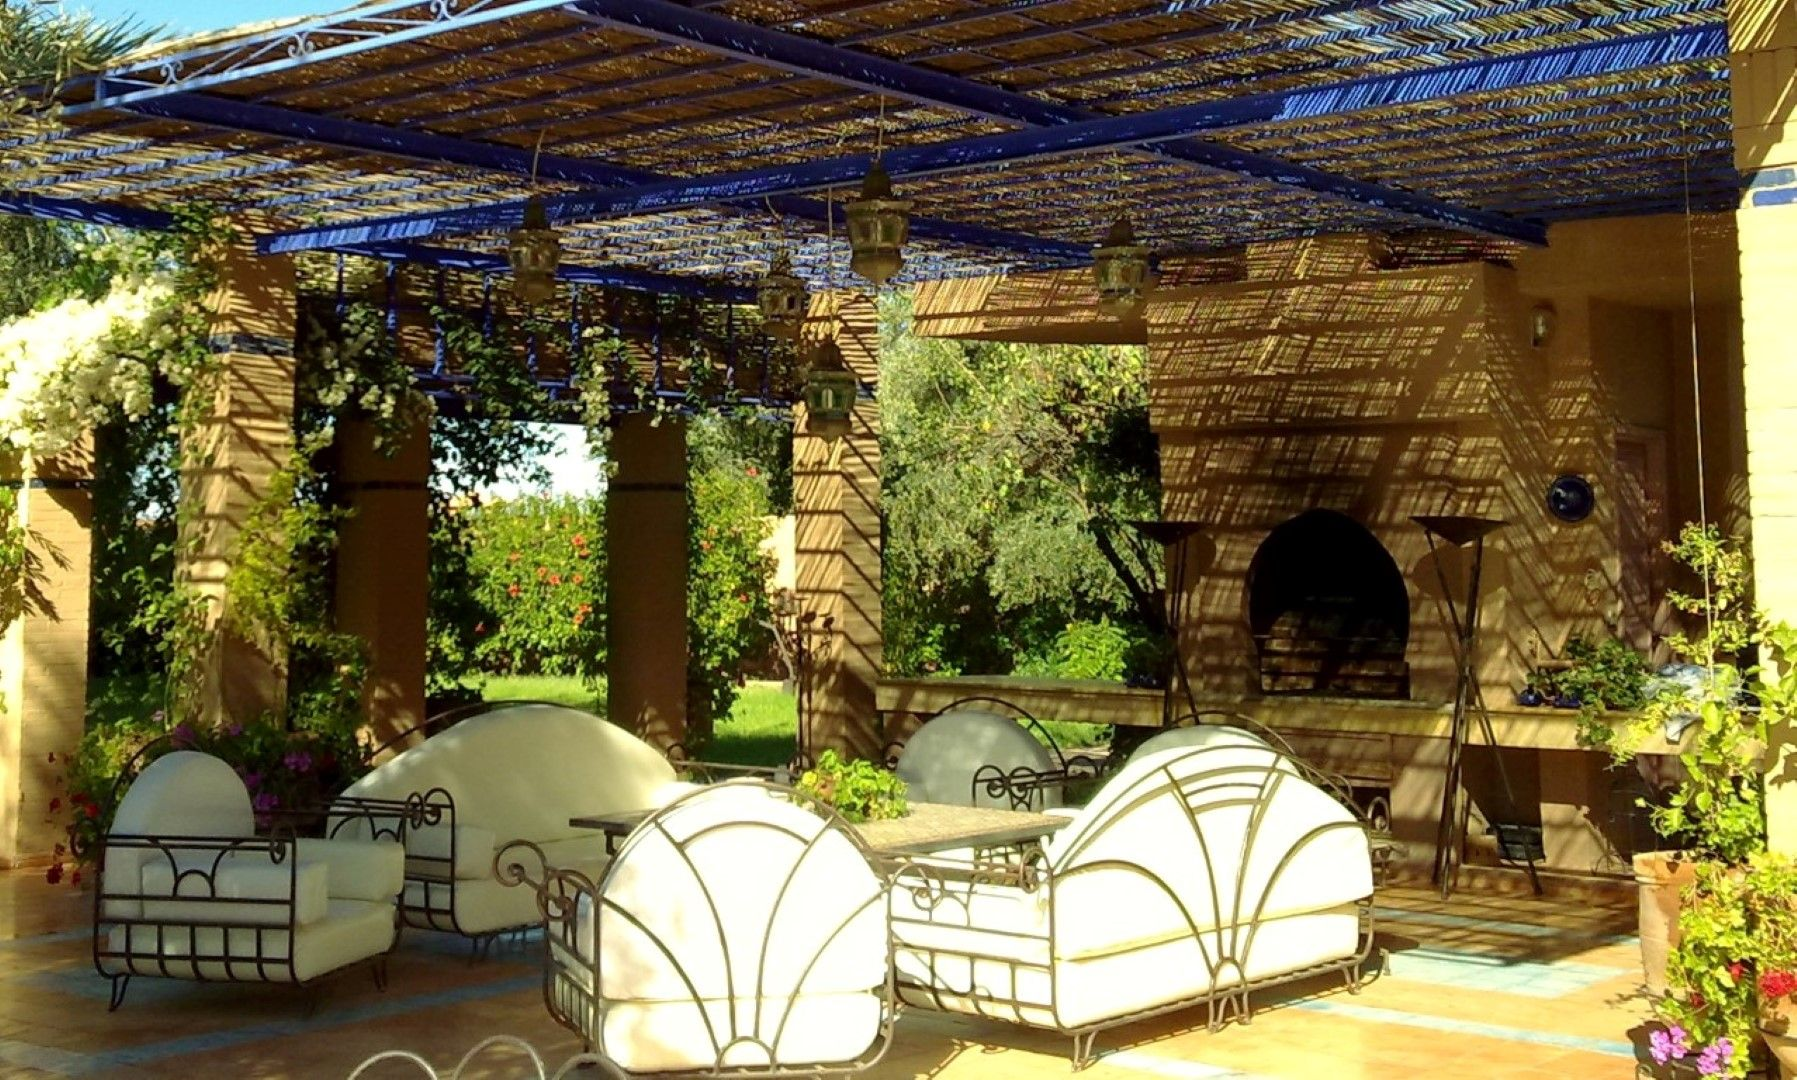 Maison du jardin zen belle maison louer marrakech for Jardin villa maroc